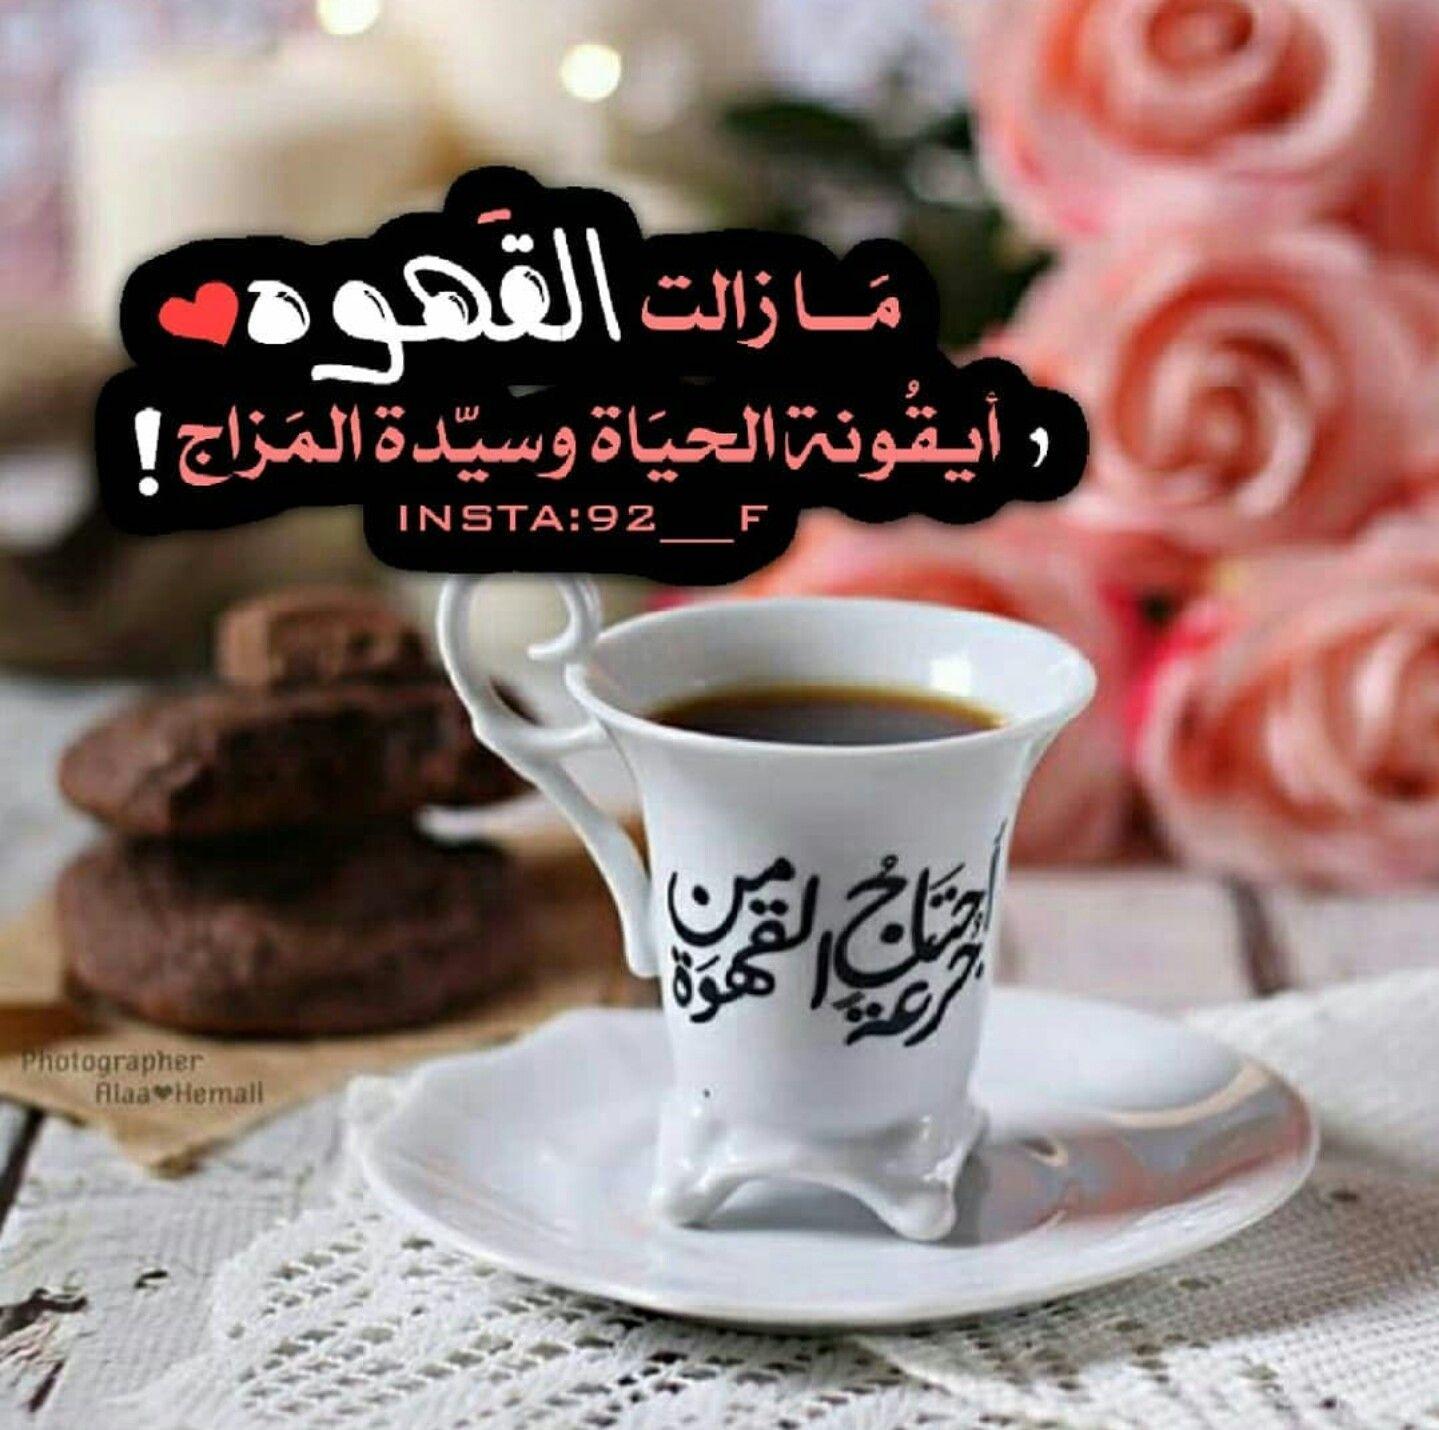 Pin By La Reina Aya On عبارات Phrases Coffee Art Spiced Coffee Chocolate Coffee